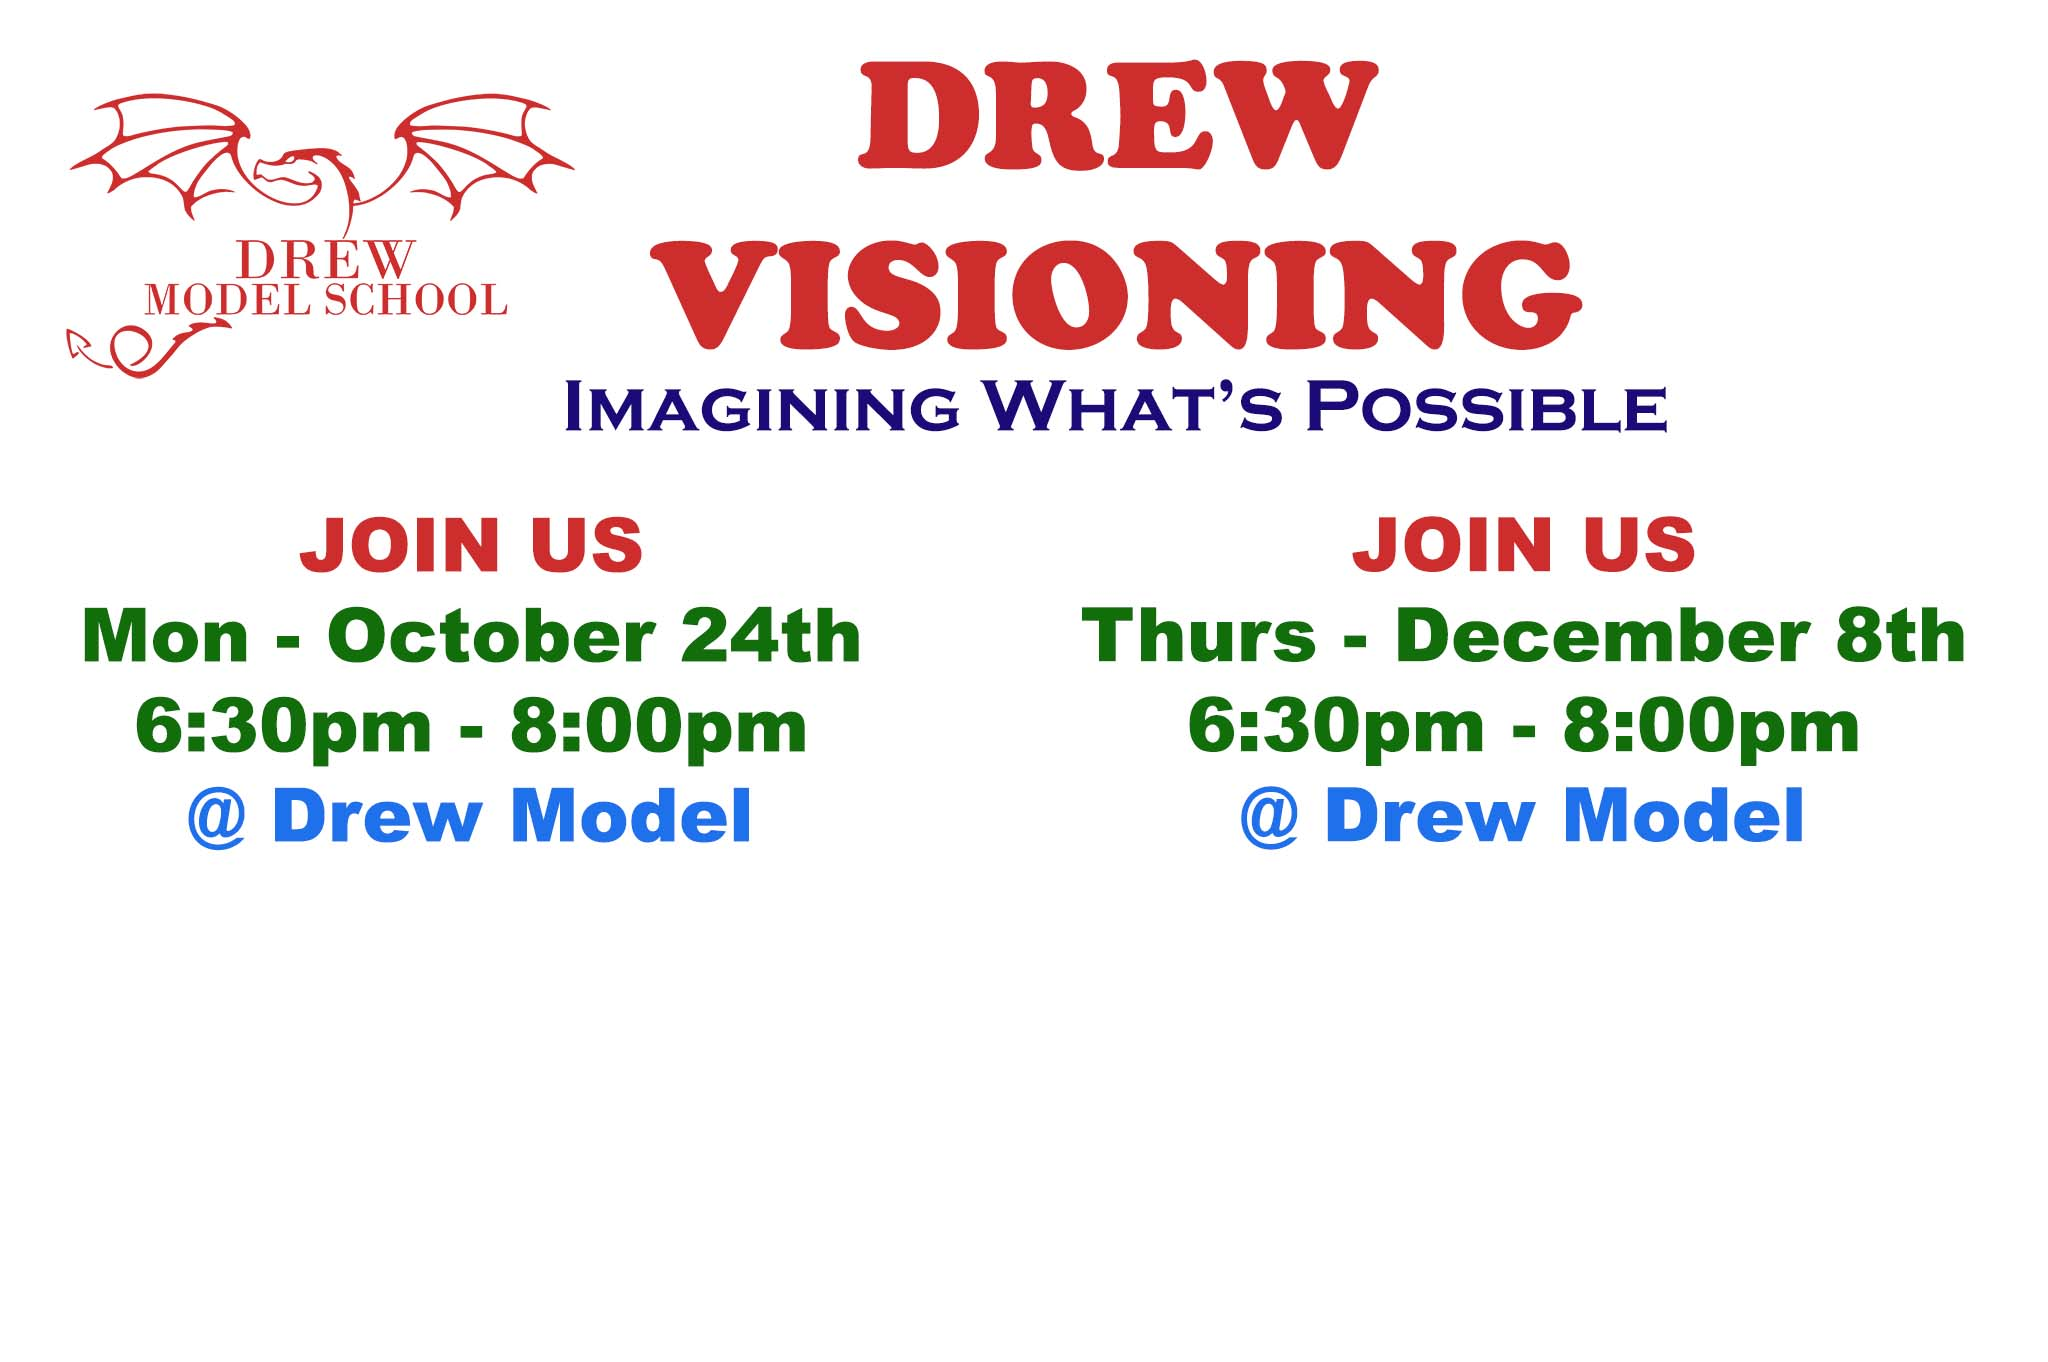 Get Involved in Drew's Future